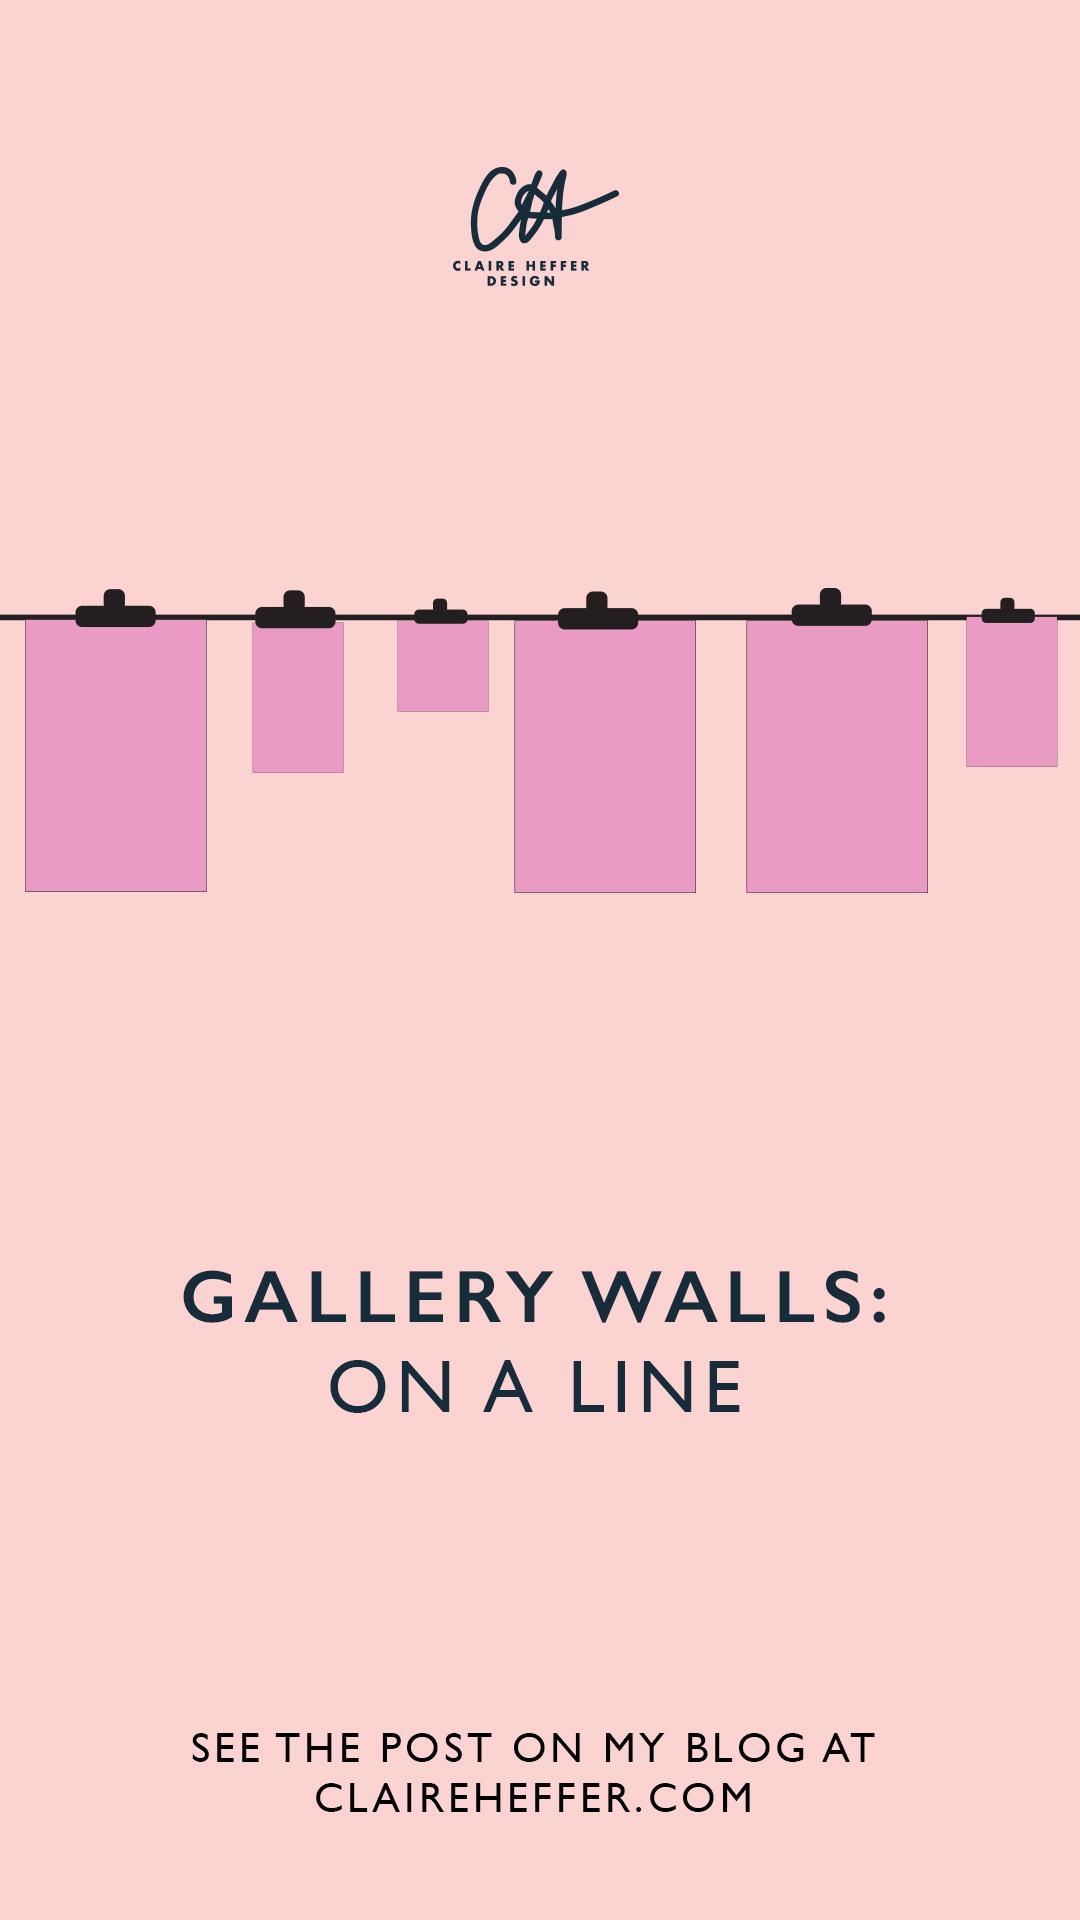 GALLERY WALLS ON A LINE.jpg